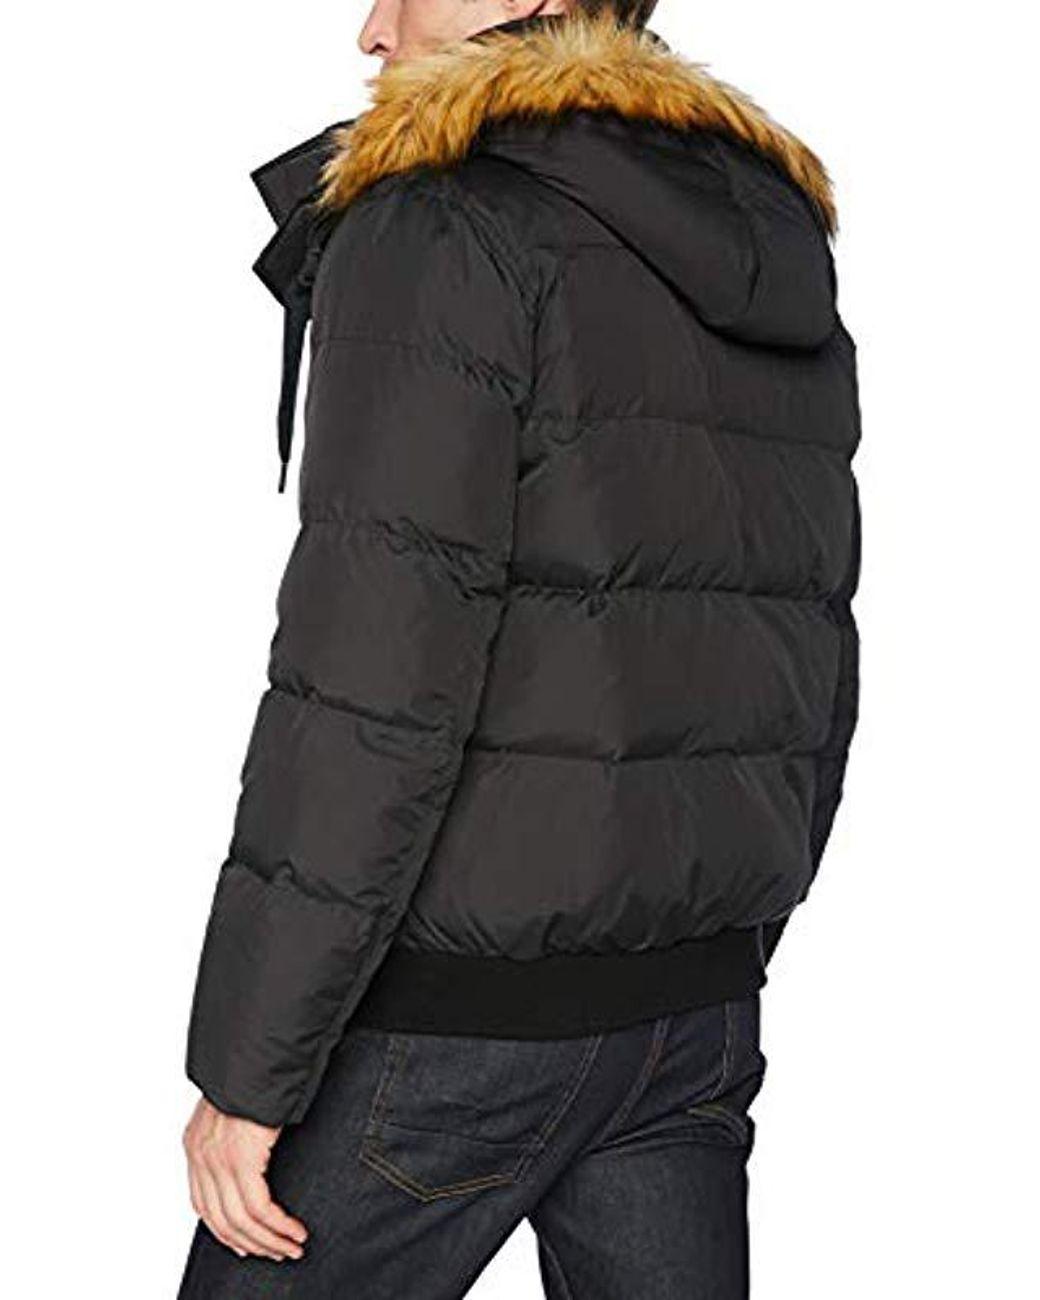 Baby Girl Boy Winter Outerwear Kids Jacket Coat Snowsuit Pollyhb Baby Warm Outerwear